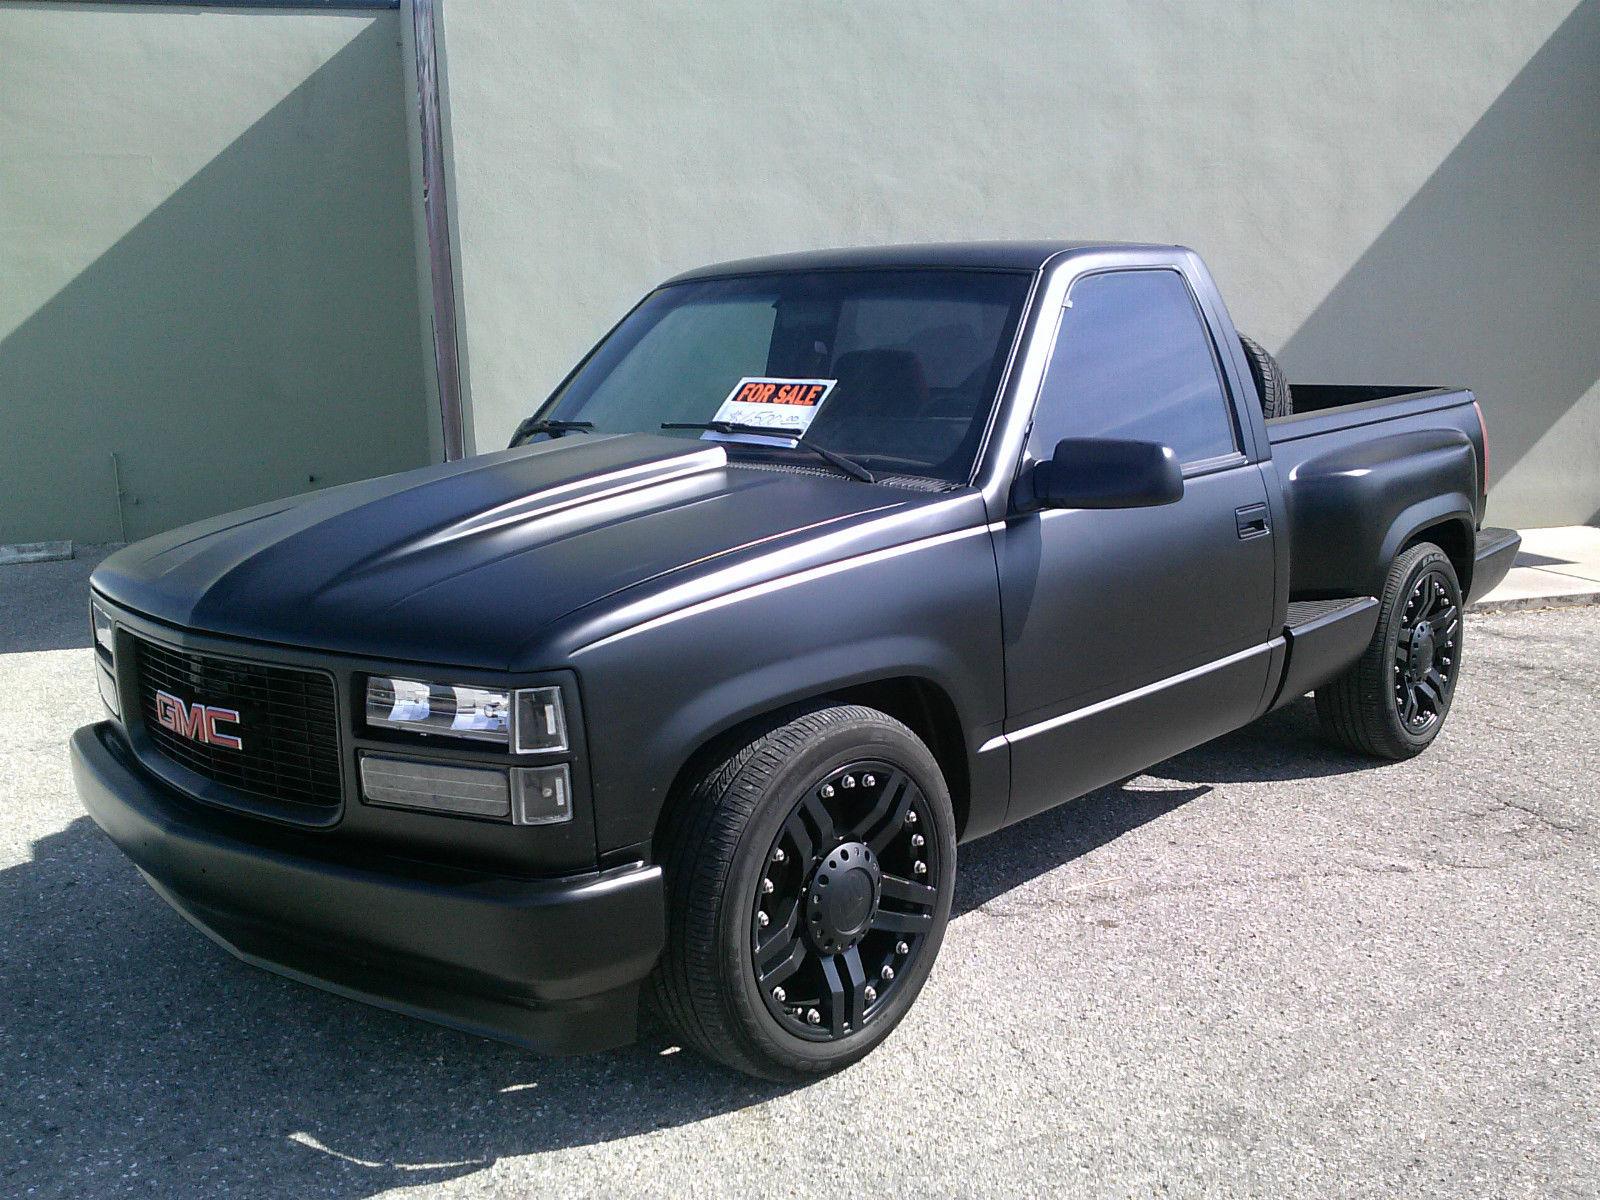 1994 gmc sierra sle stepside custom pickup 1500 20 39 wheels lowered rat rod black. Black Bedroom Furniture Sets. Home Design Ideas